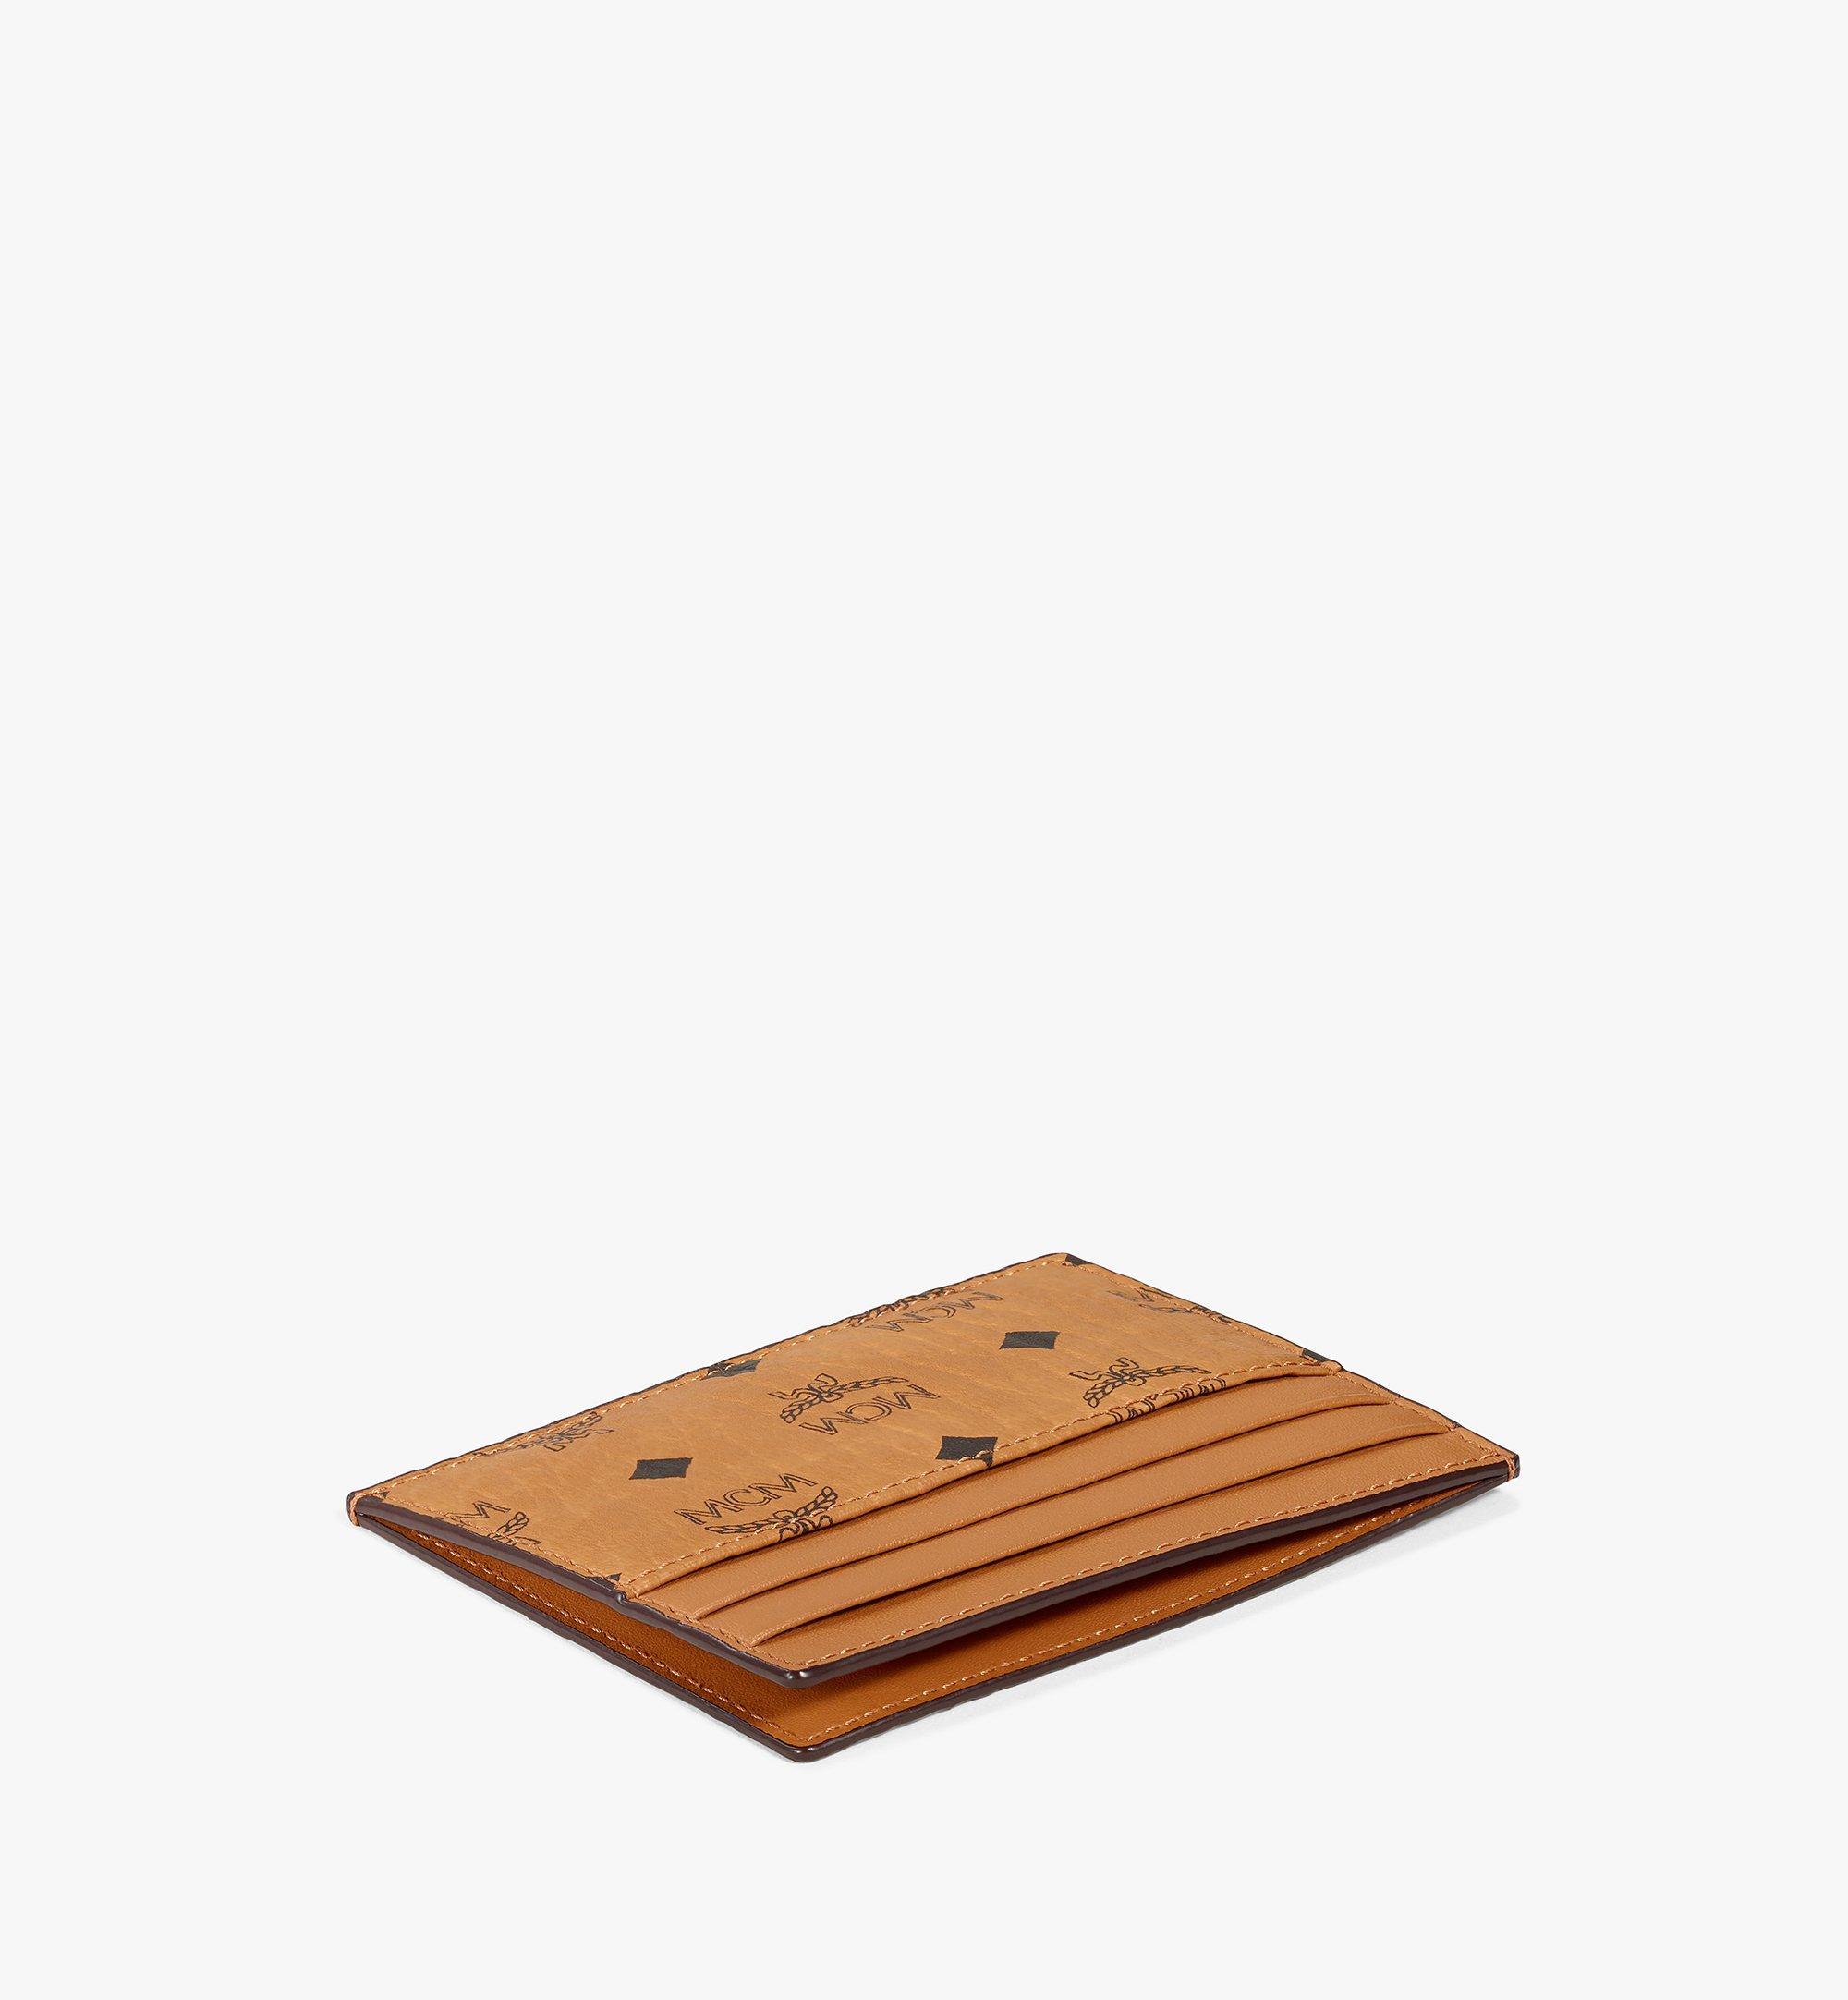 MCM Card Case in Visetos Original Cognac MXAAAVI02CO001 Alternate View 1